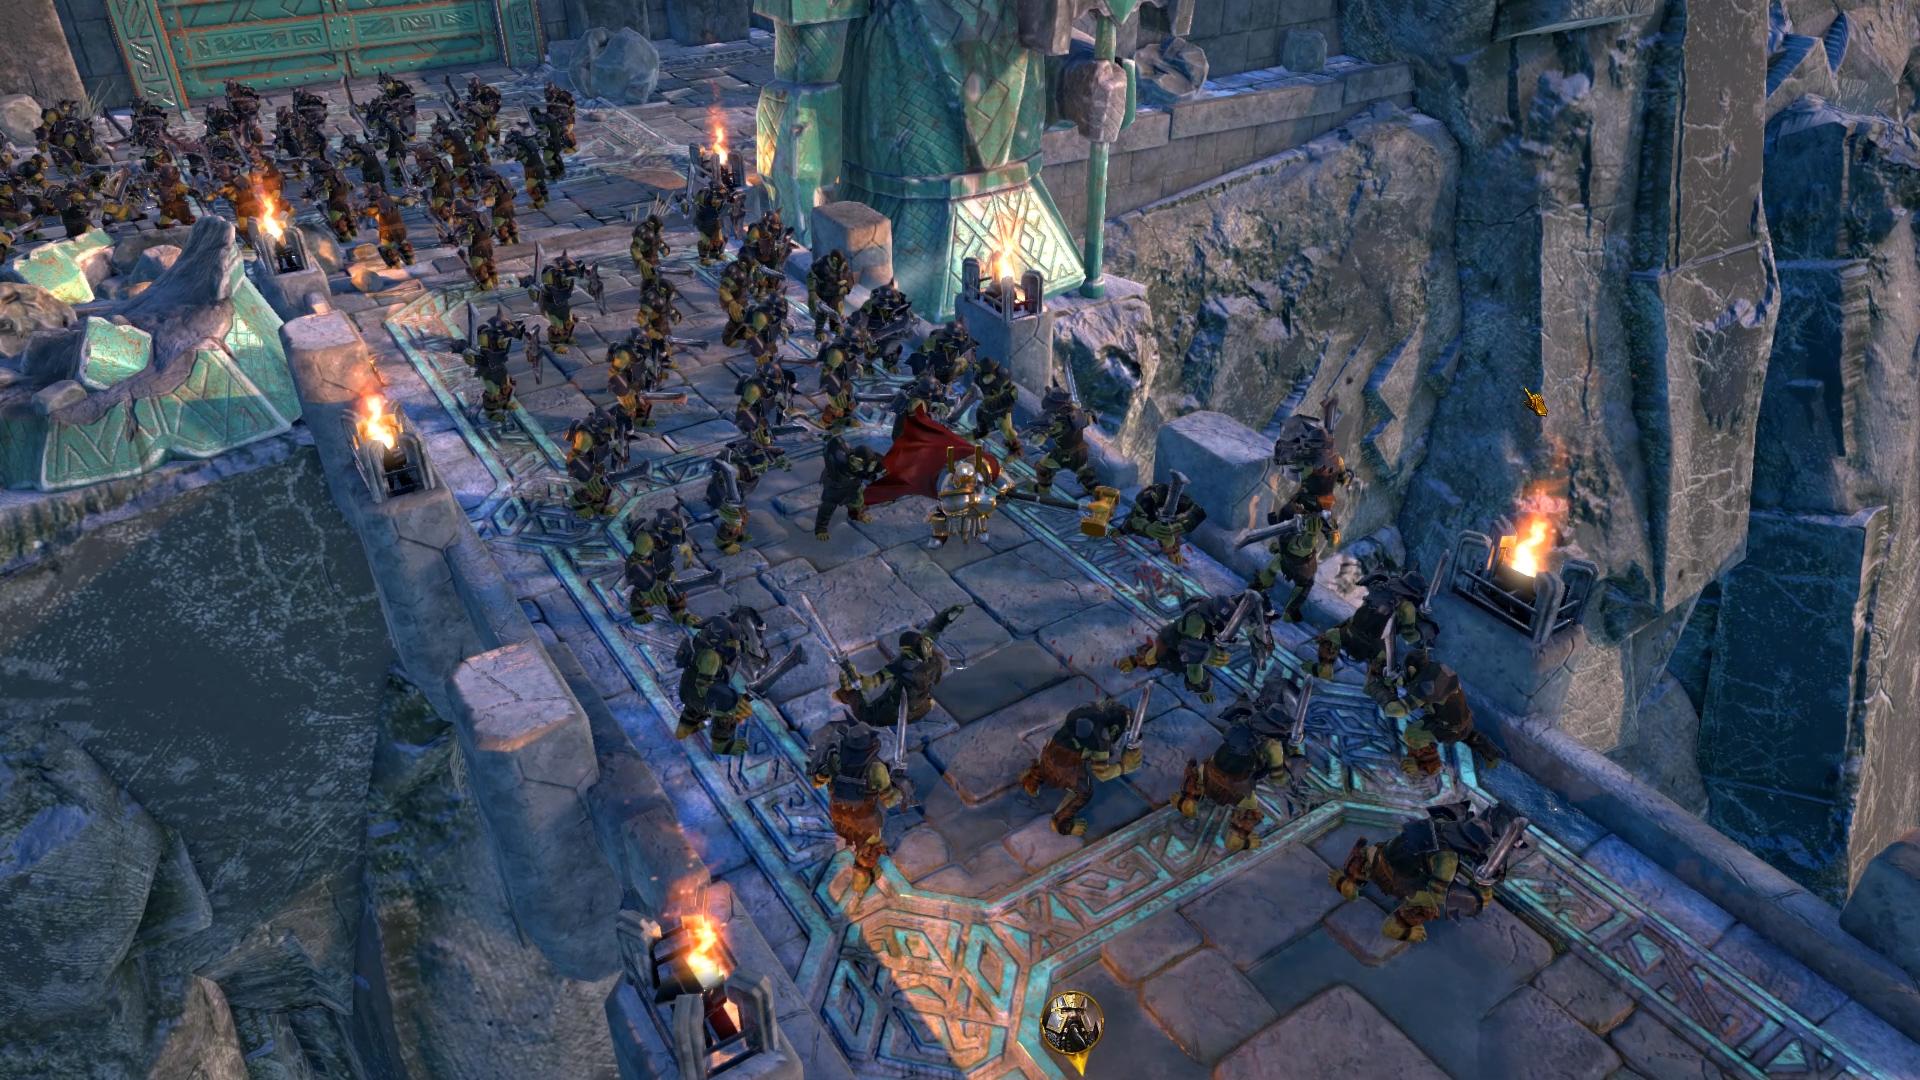 The Dwarves screenshot